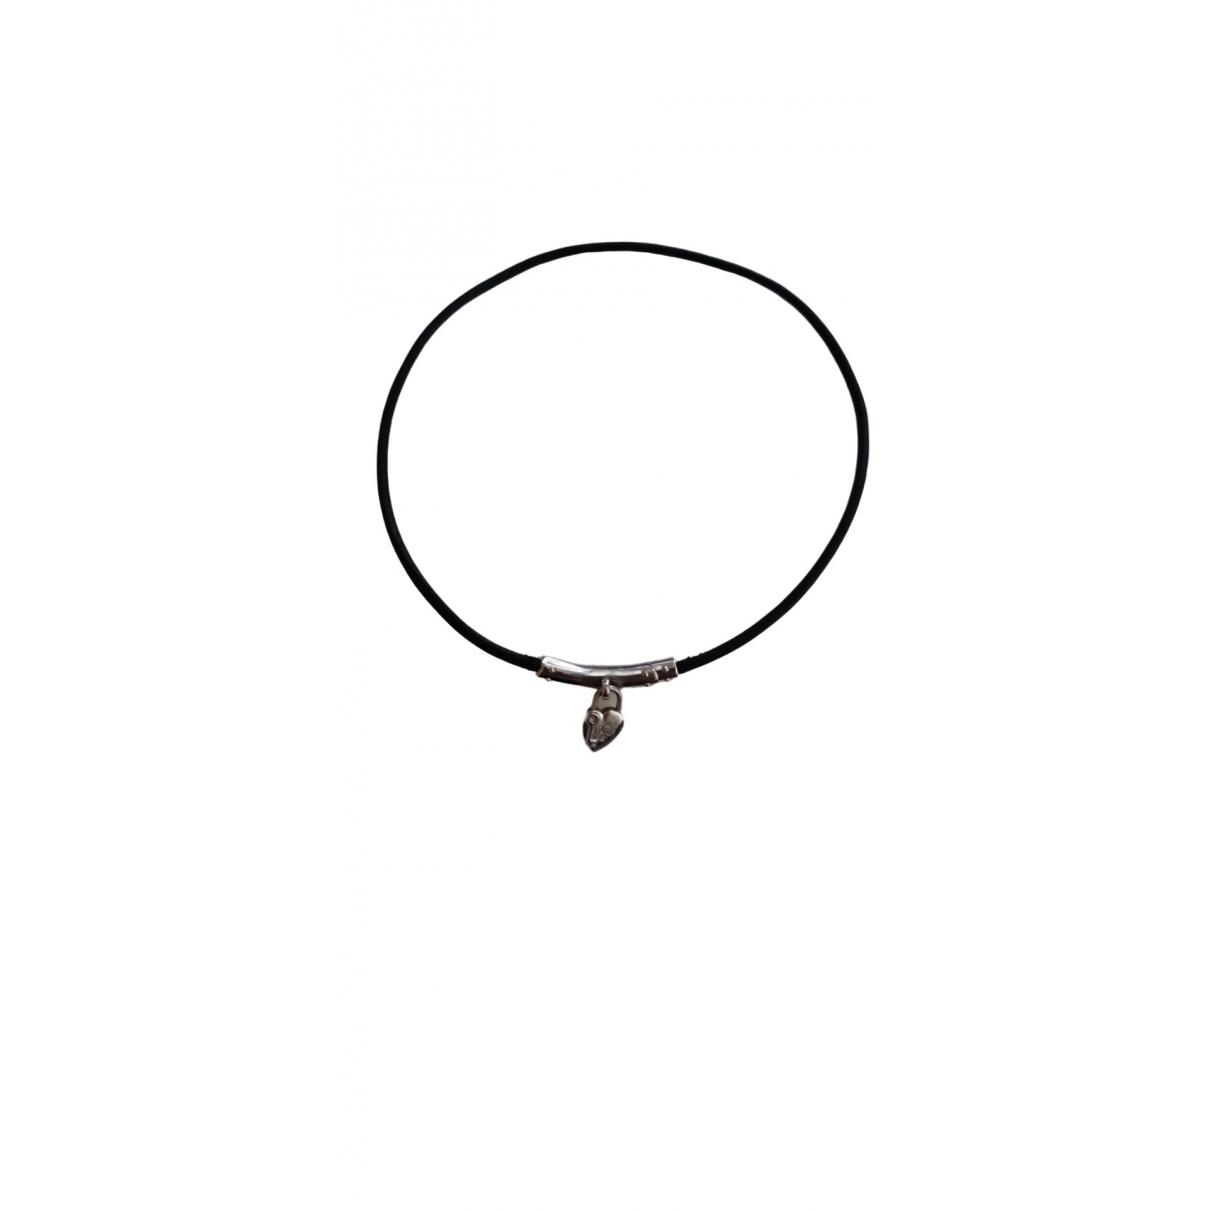 Hermès \N Black Leather necklace for Women \N